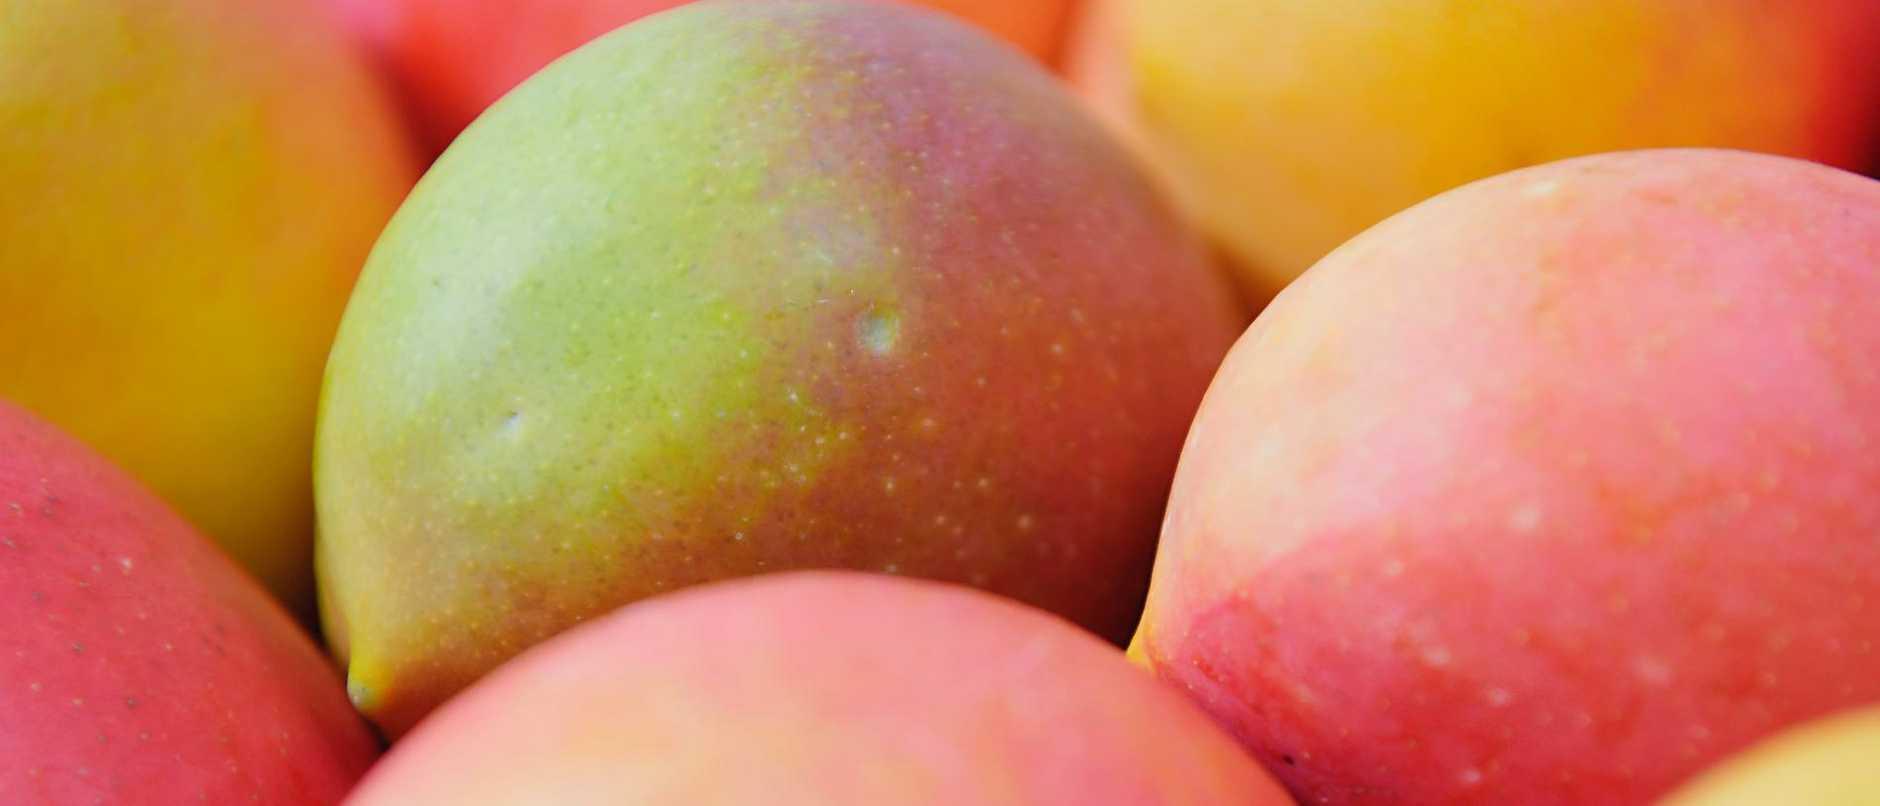 Mango species